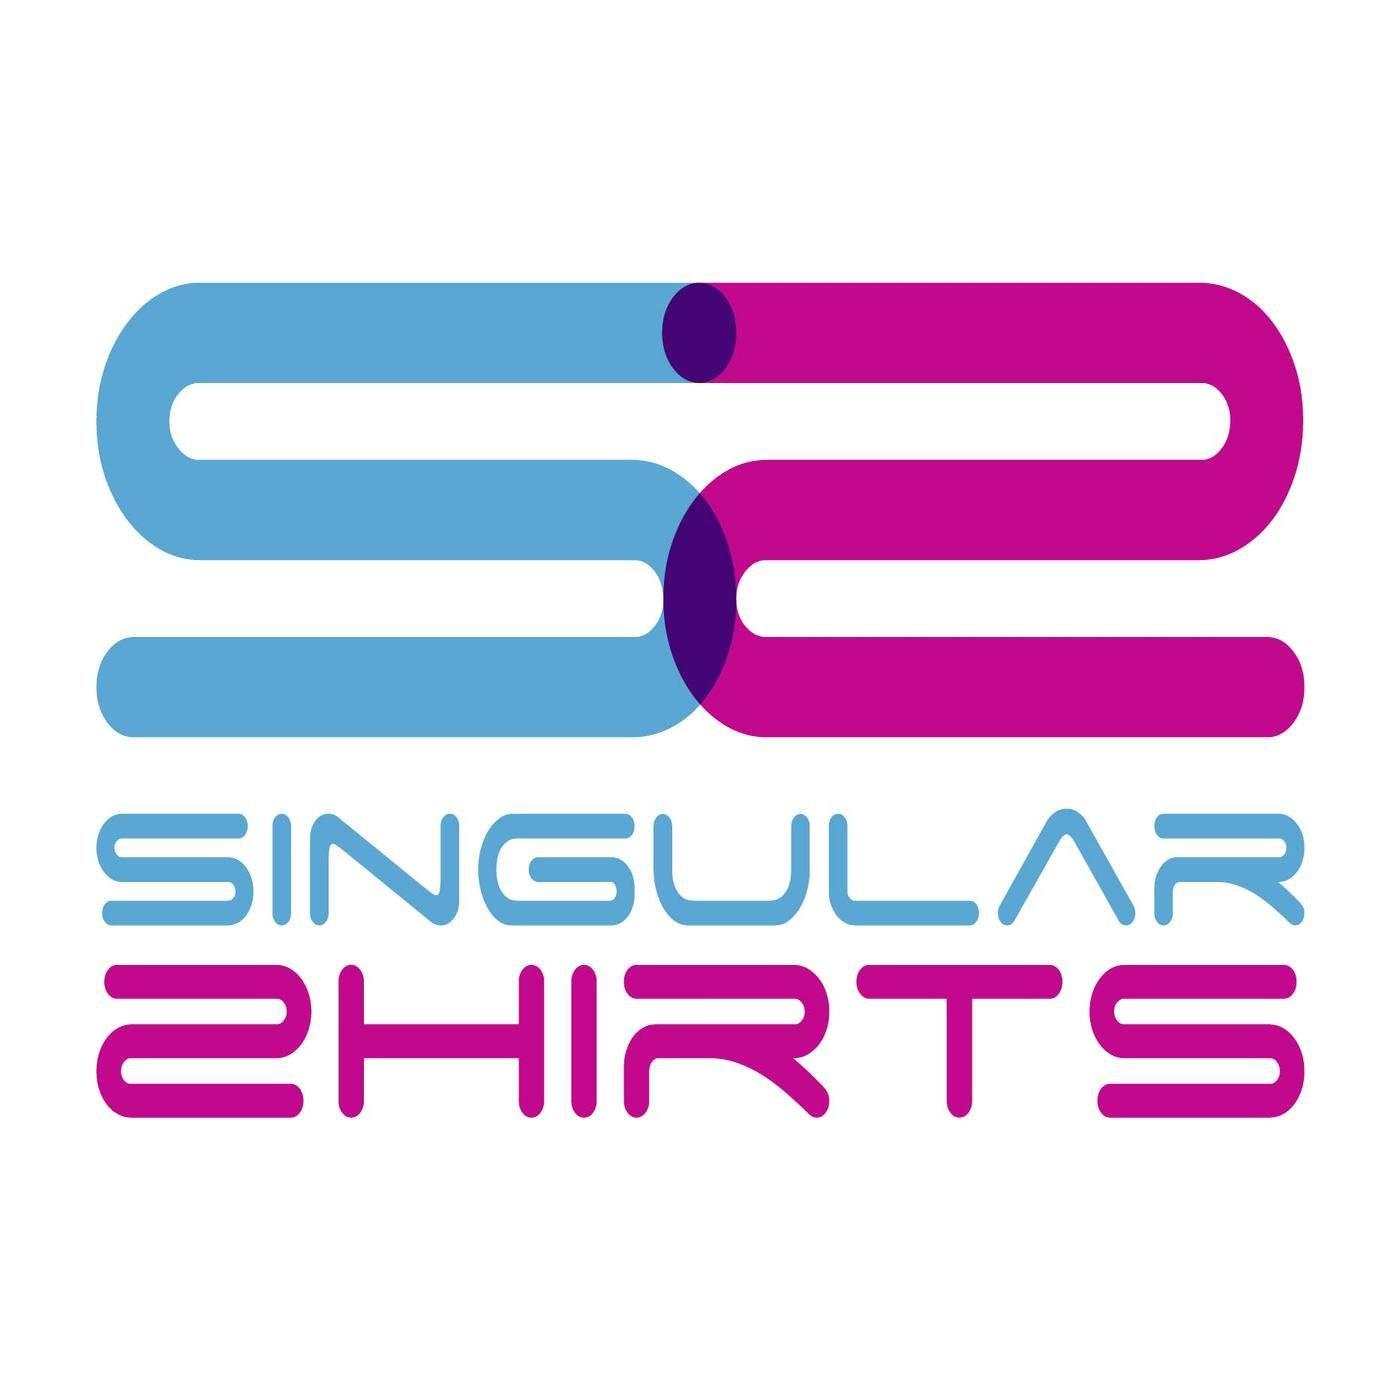 <![CDATA[Singular Shirts]]>